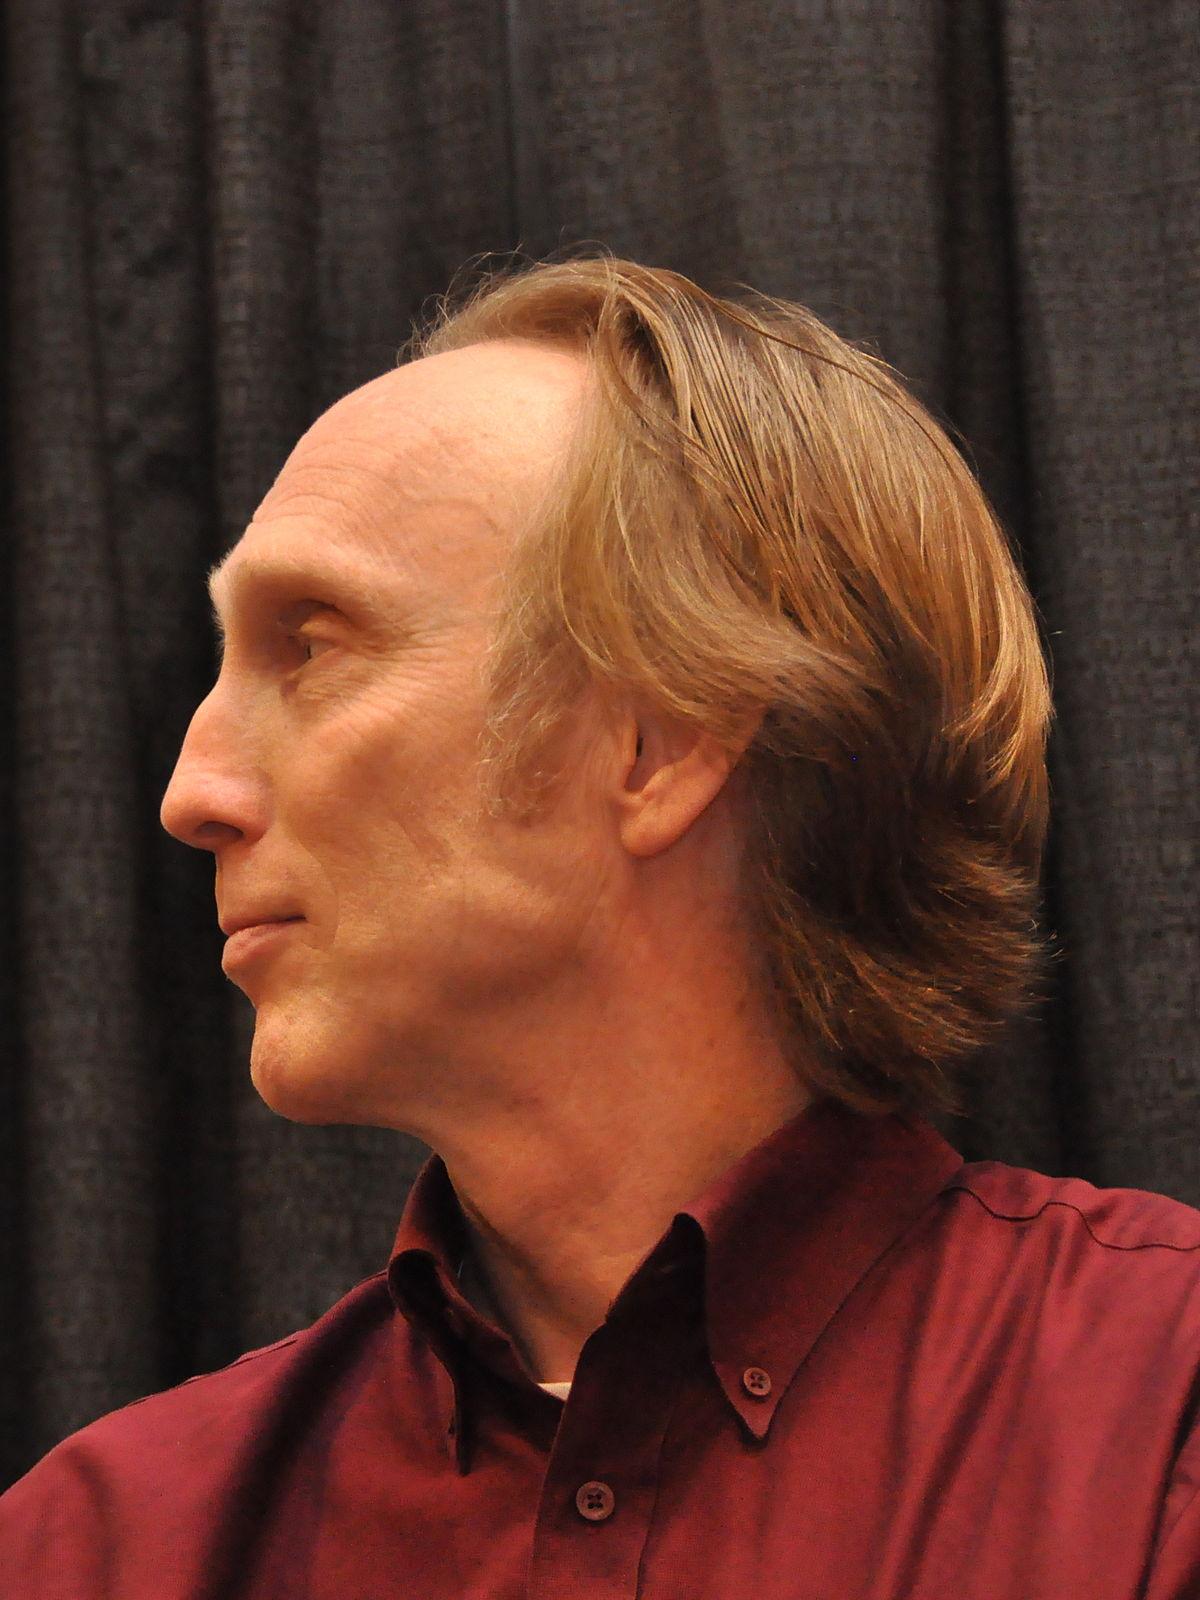 Henry Selick - Wikipedia